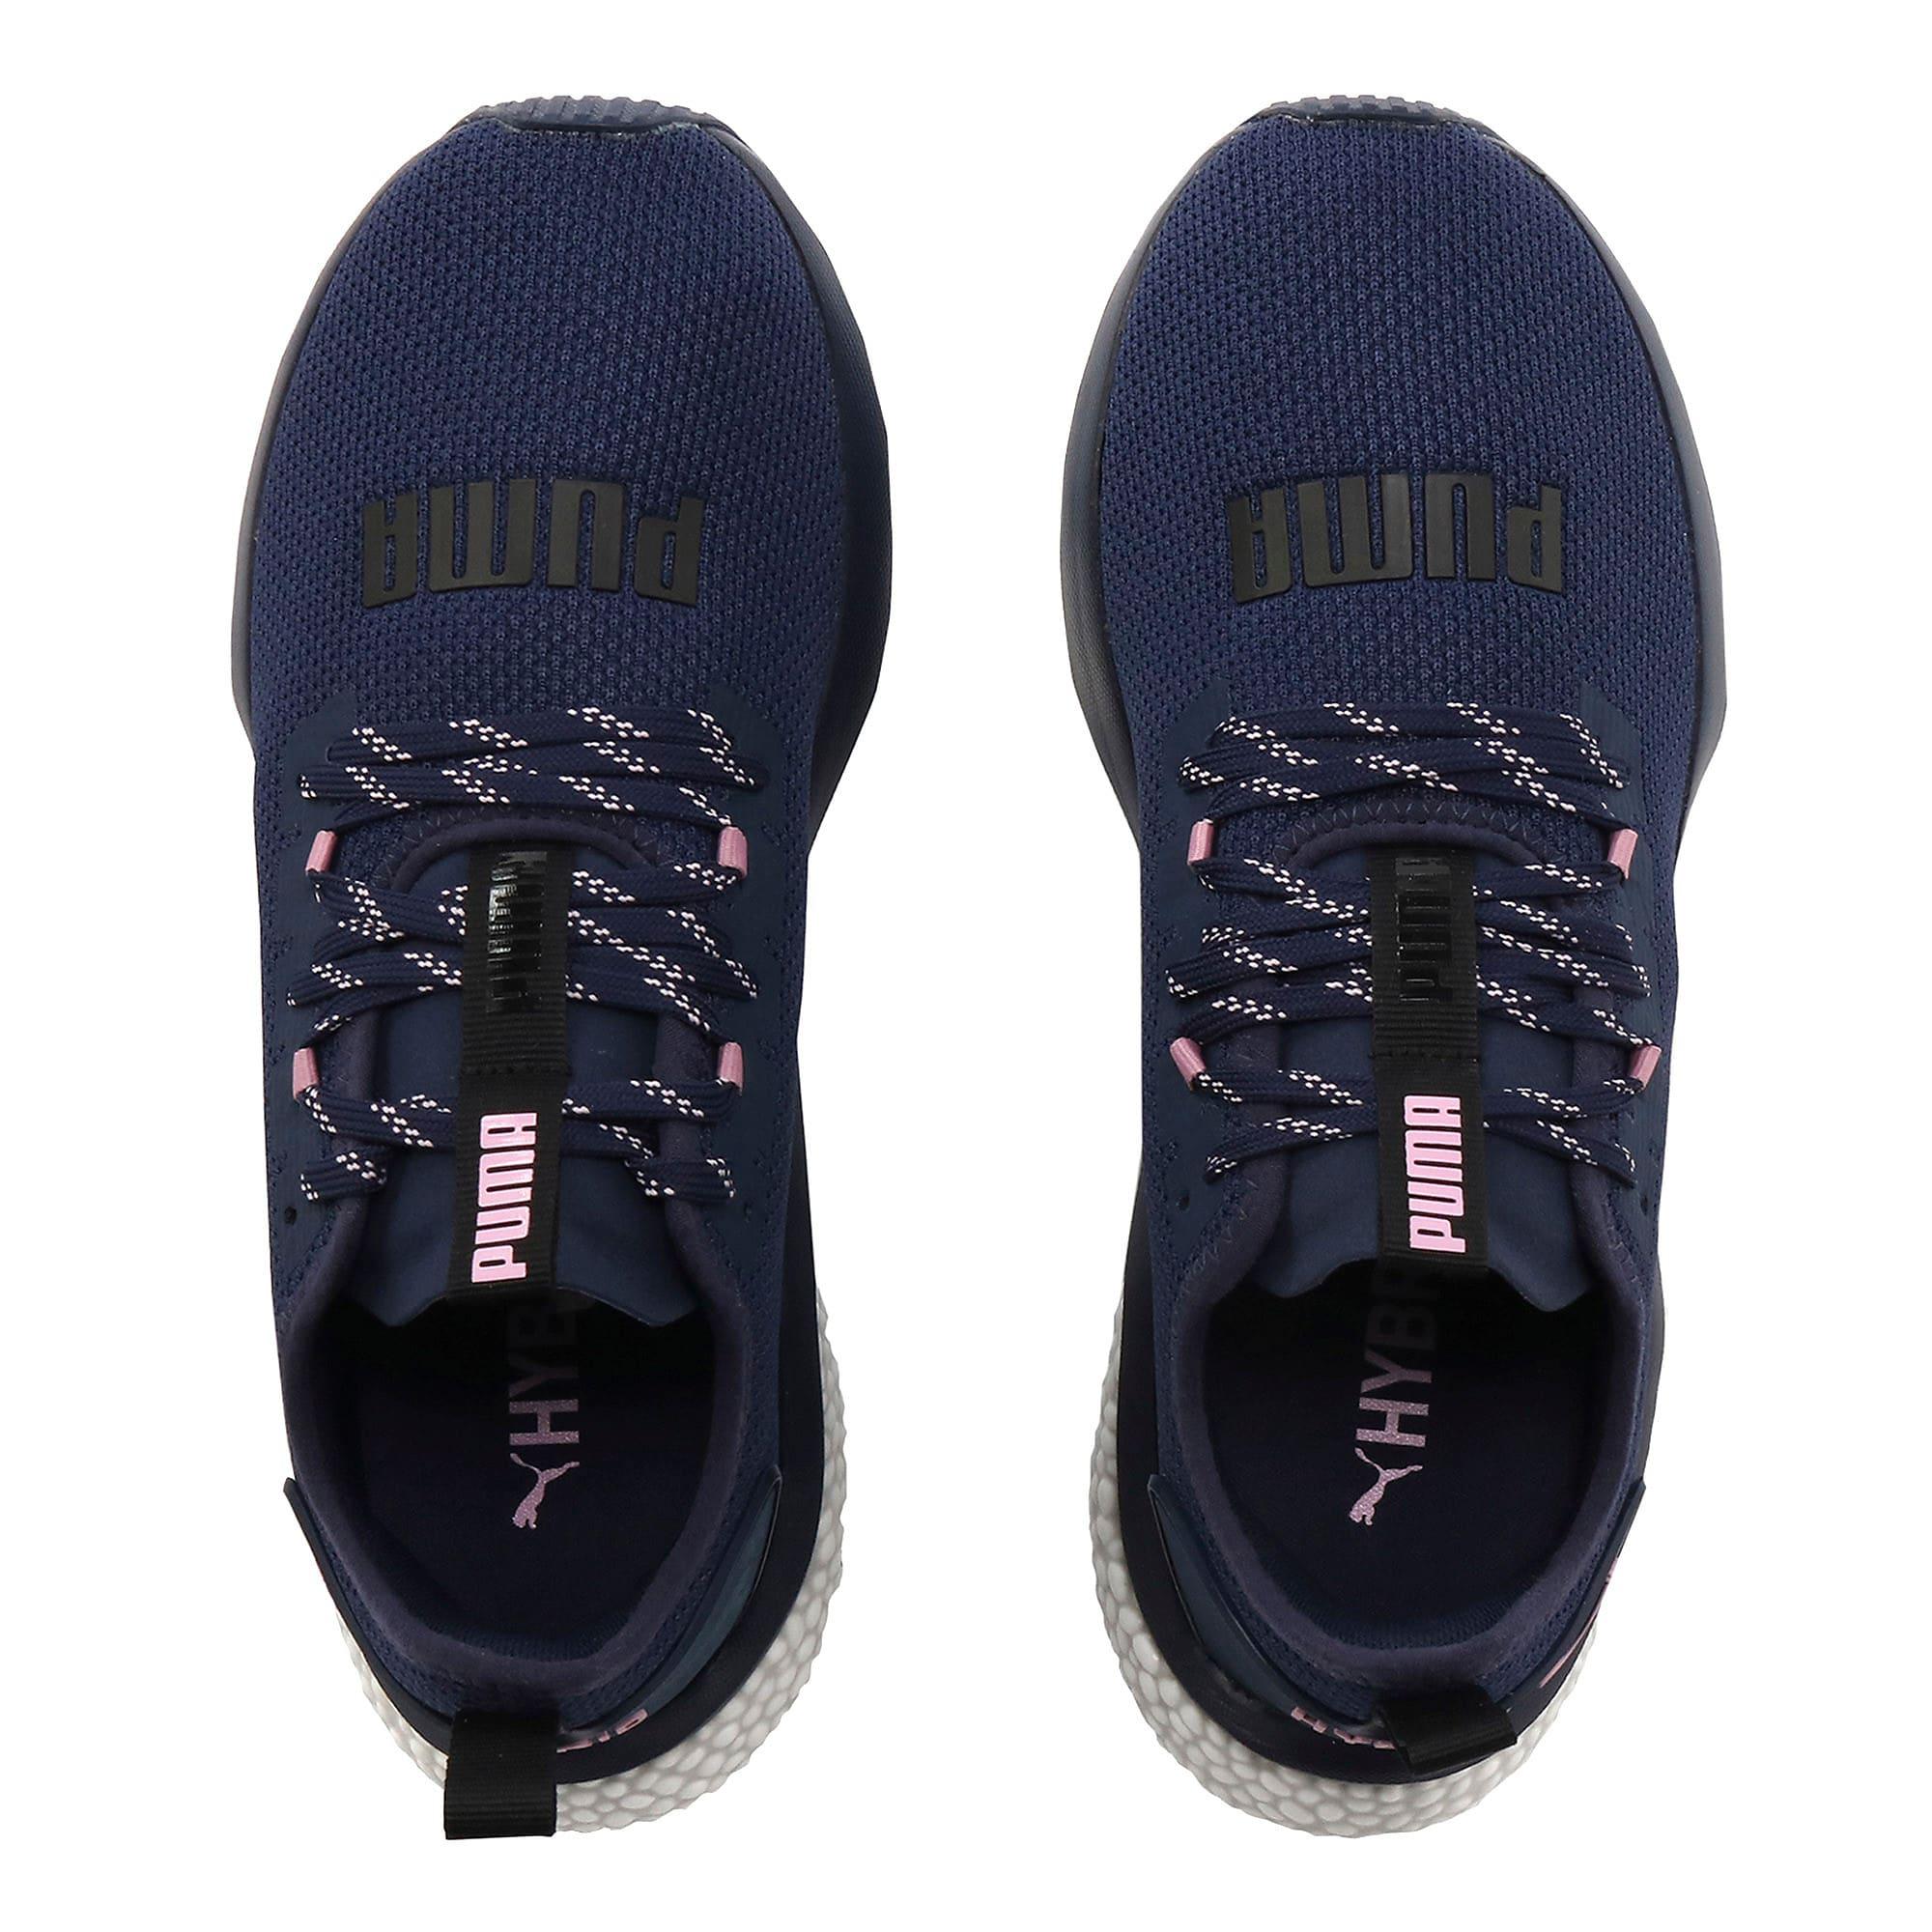 Thumbnail 6 of HYBRID NX Women's Running Shoes, Peacoat-Pale Pink, medium